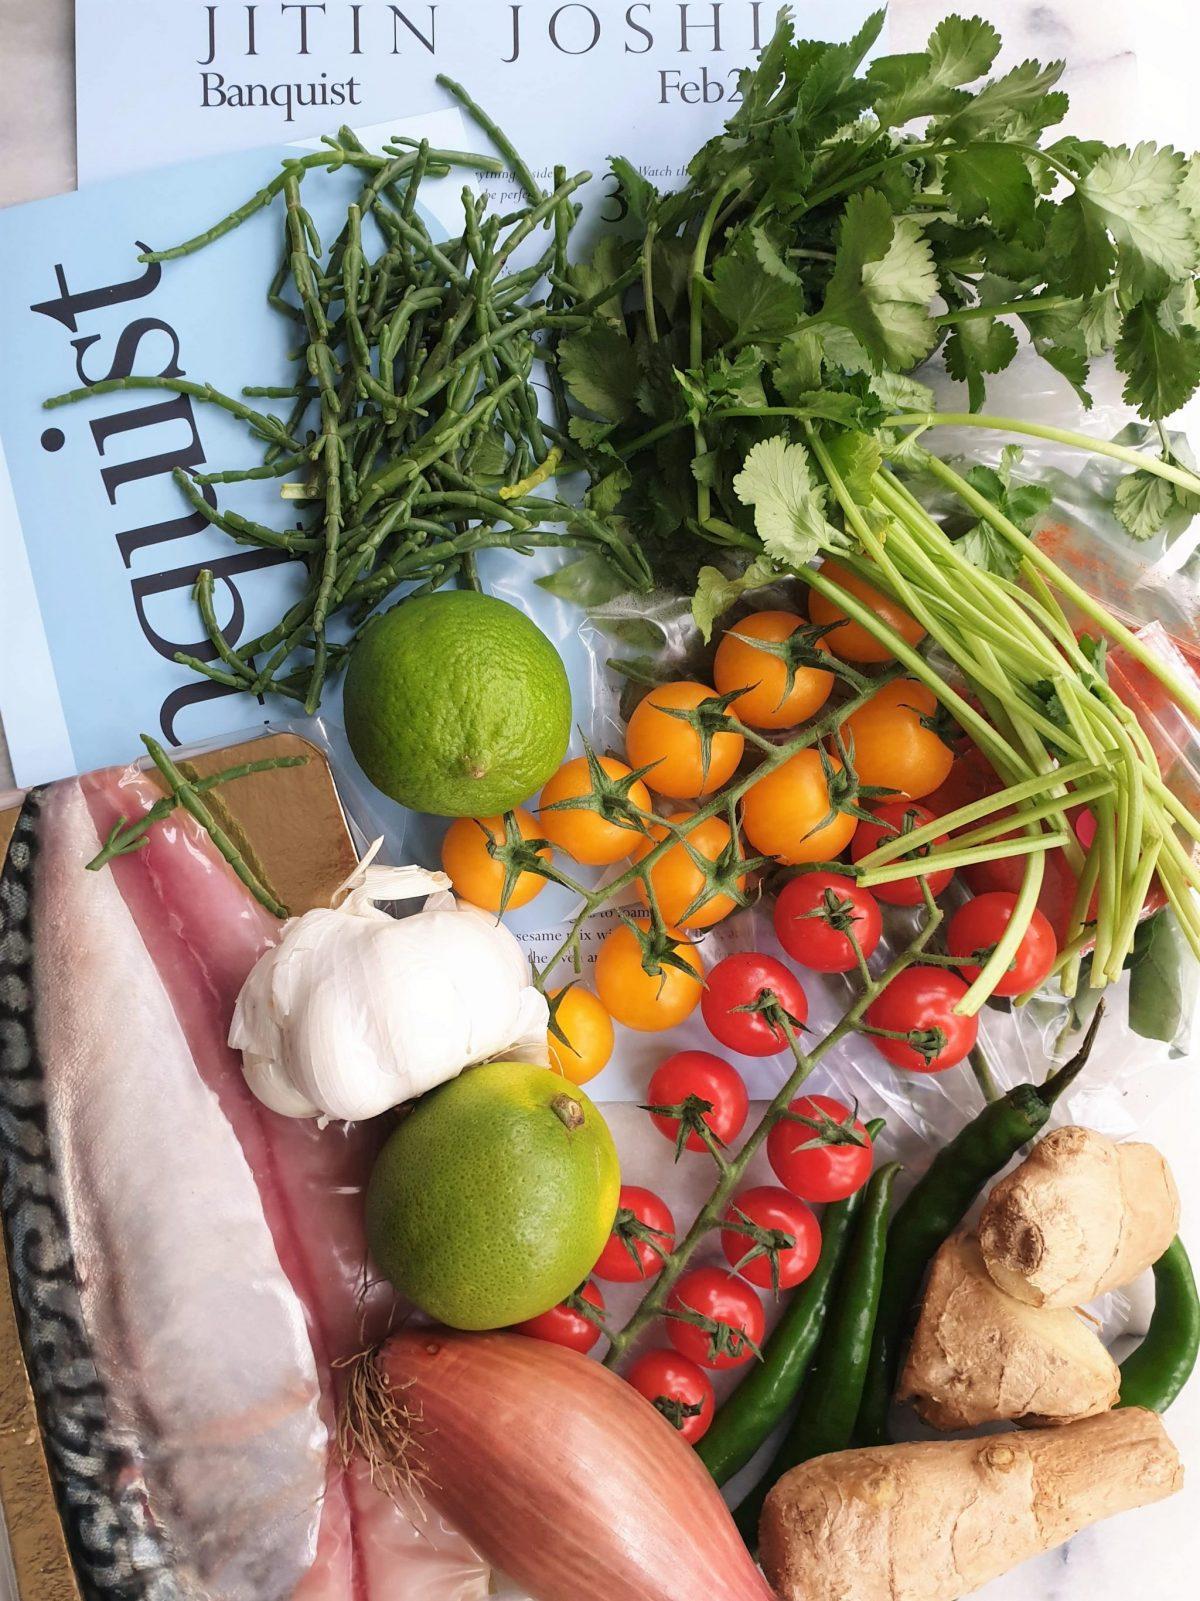 Banquist Jitin Joshi starter ingredients-min